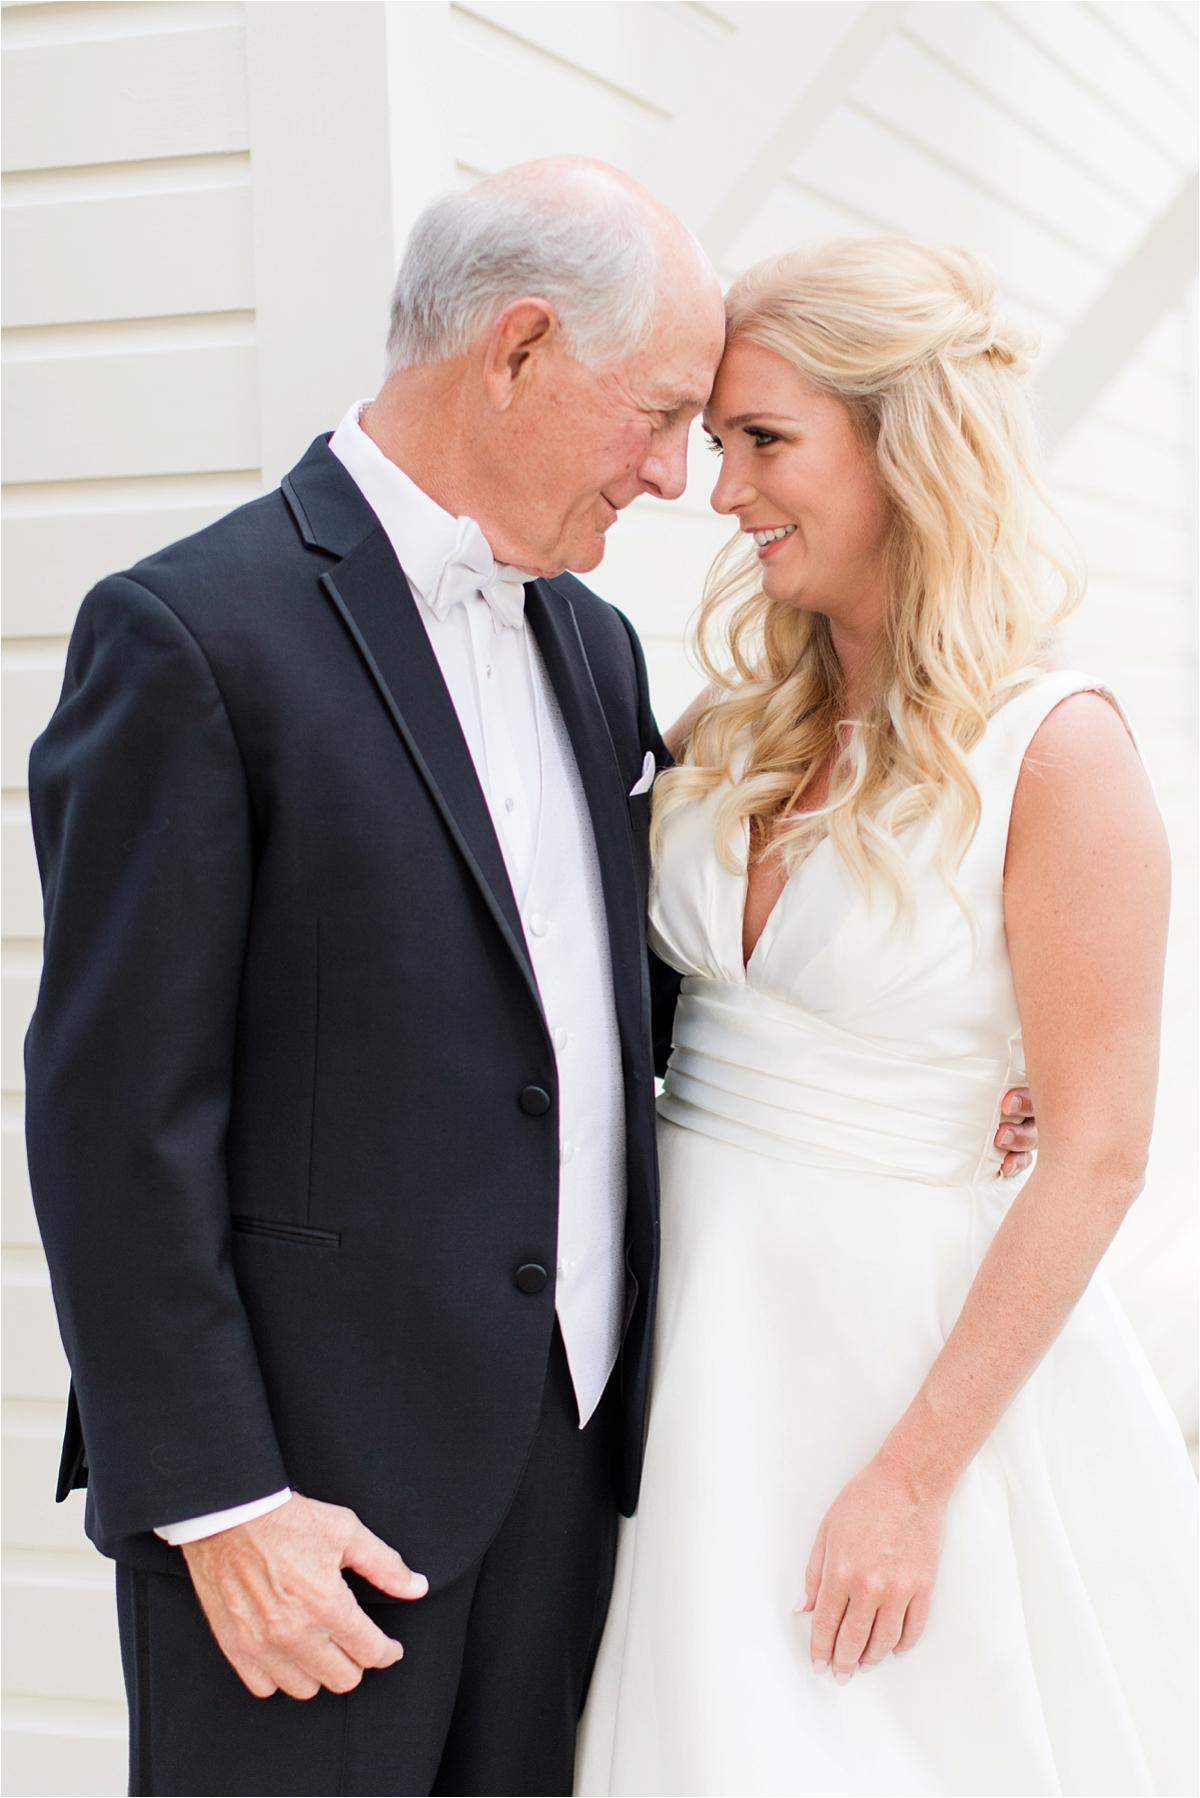 Seaside Florida Wedding Photographer-Catherine Carter + Brian-Bridal shoot-Bride-Wedding dress-Alabama photographer-Father and Daughter Wedding Photos